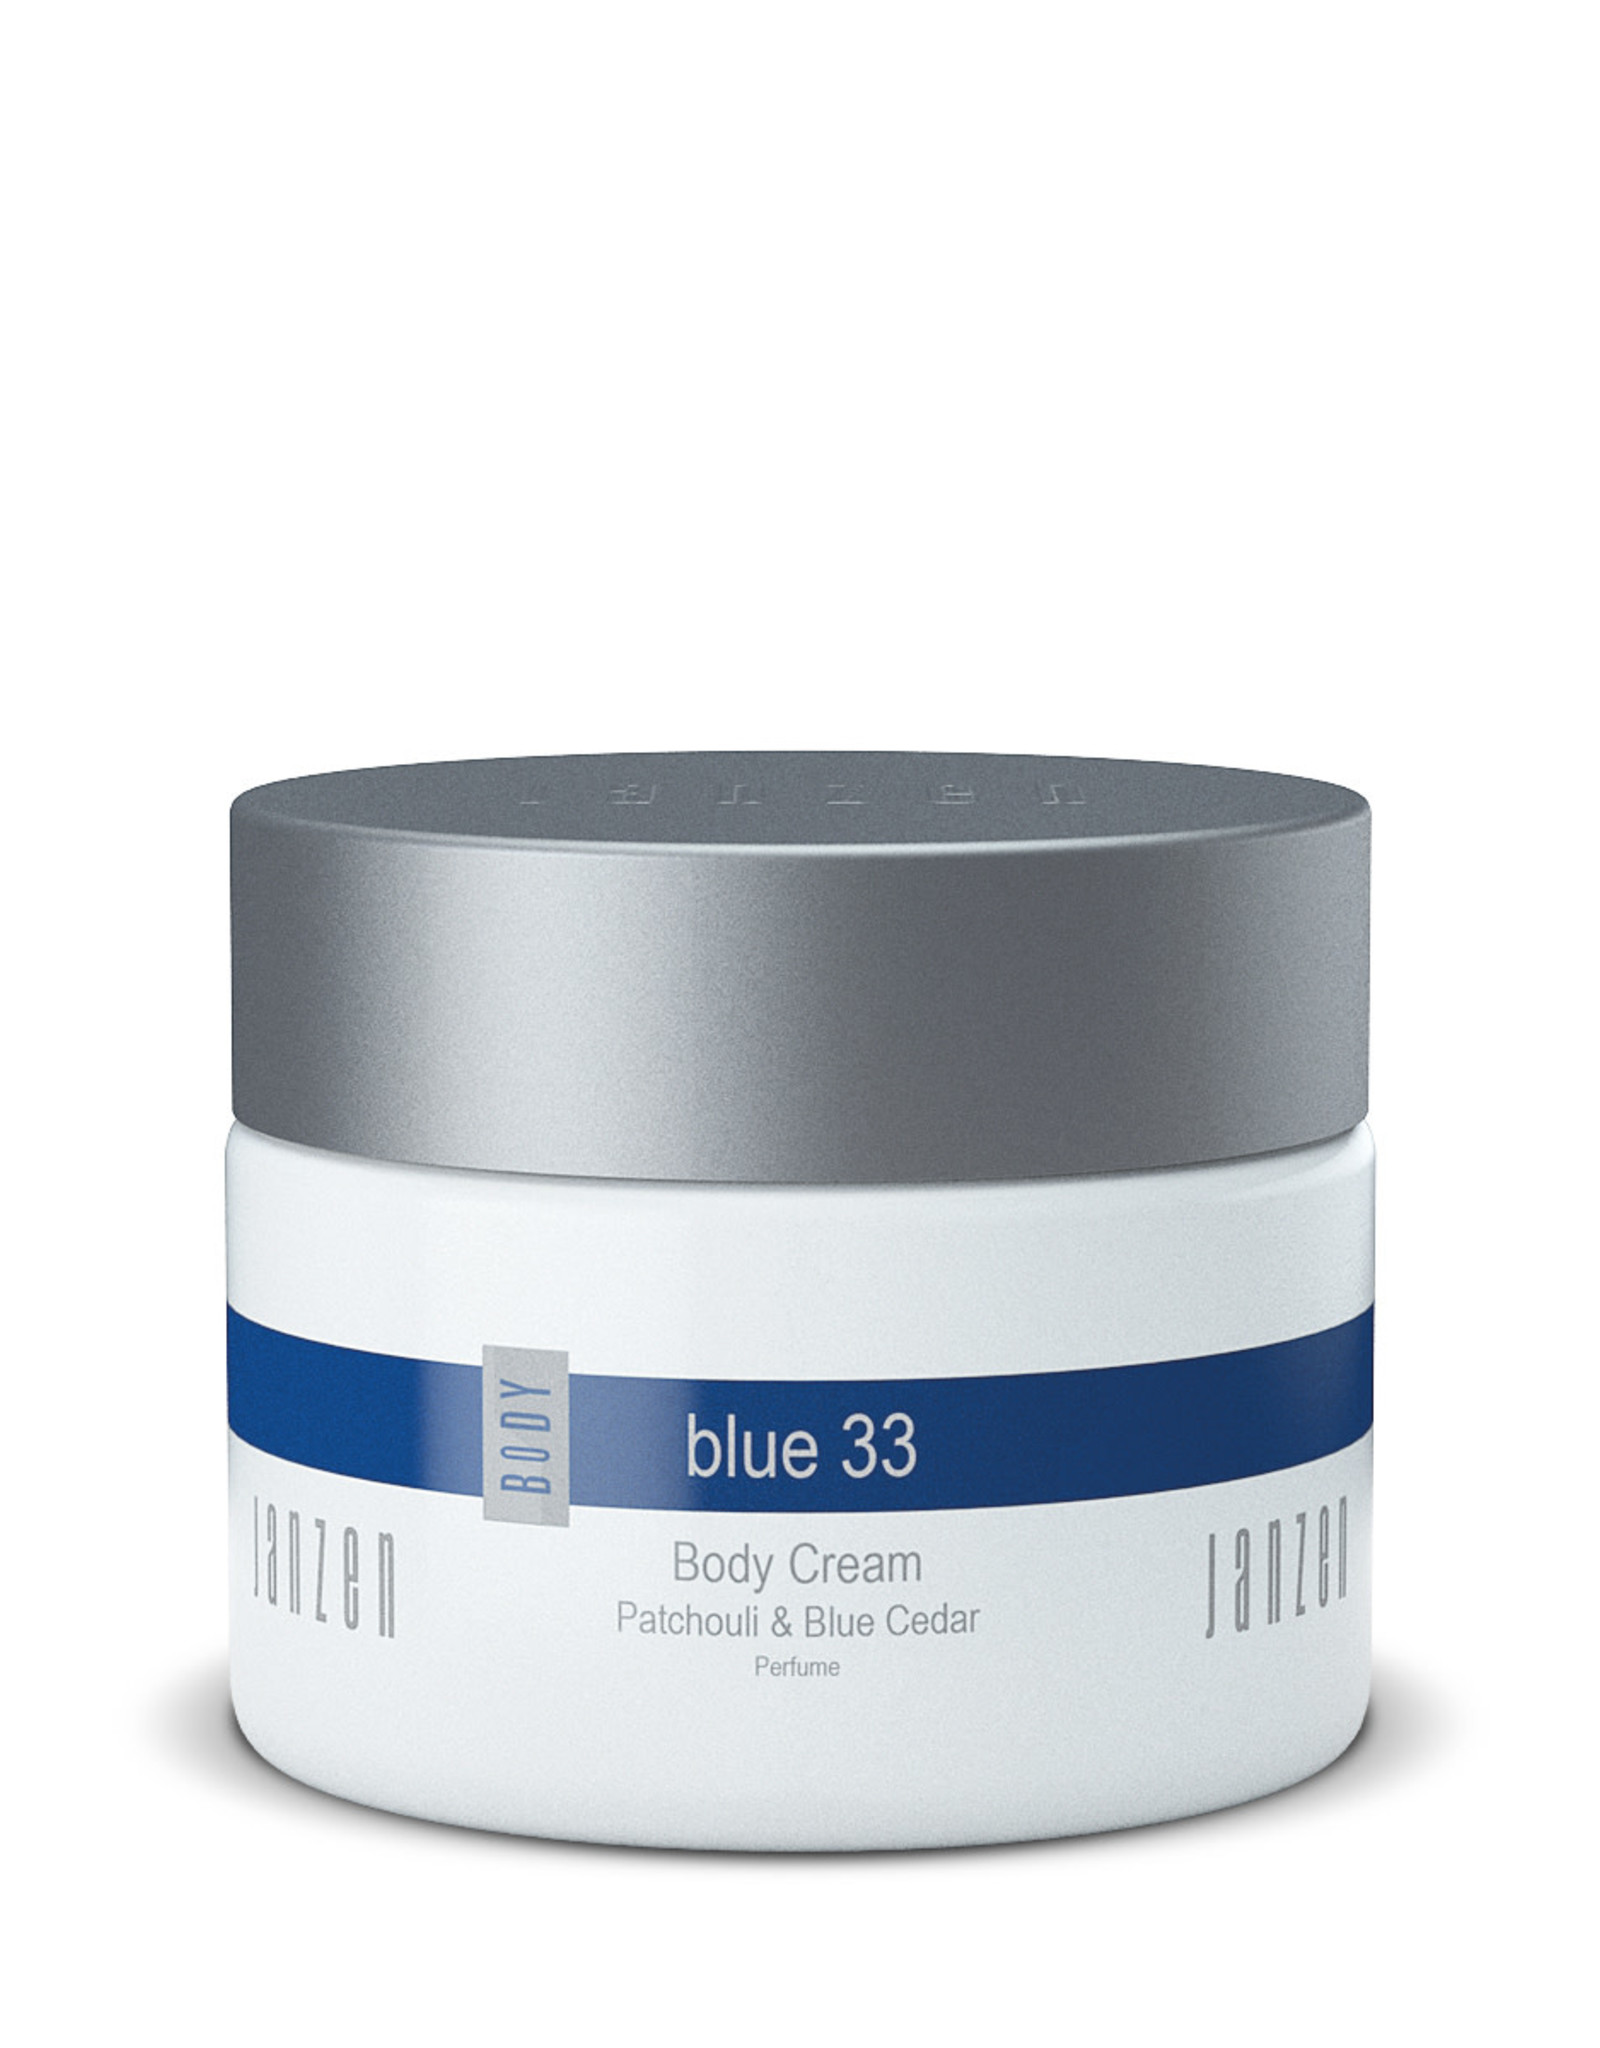 JANZEN Body Cream Blue 33 300ml - JANZEN